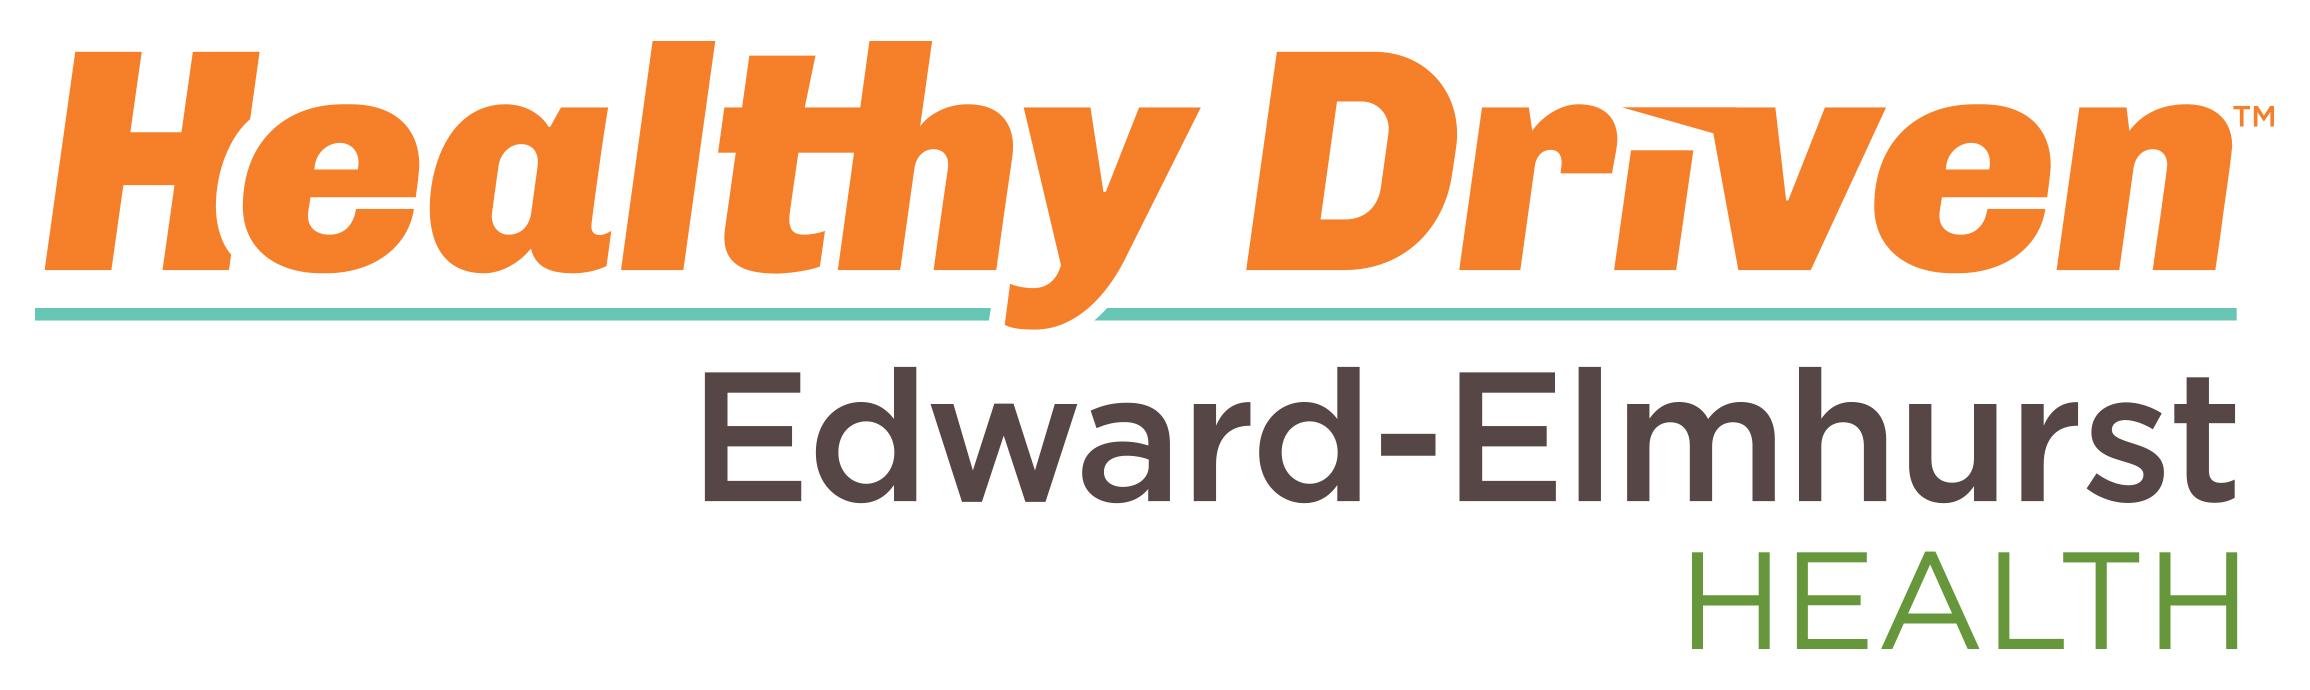 Sponsor Logo - Edward-Elmhurst Health